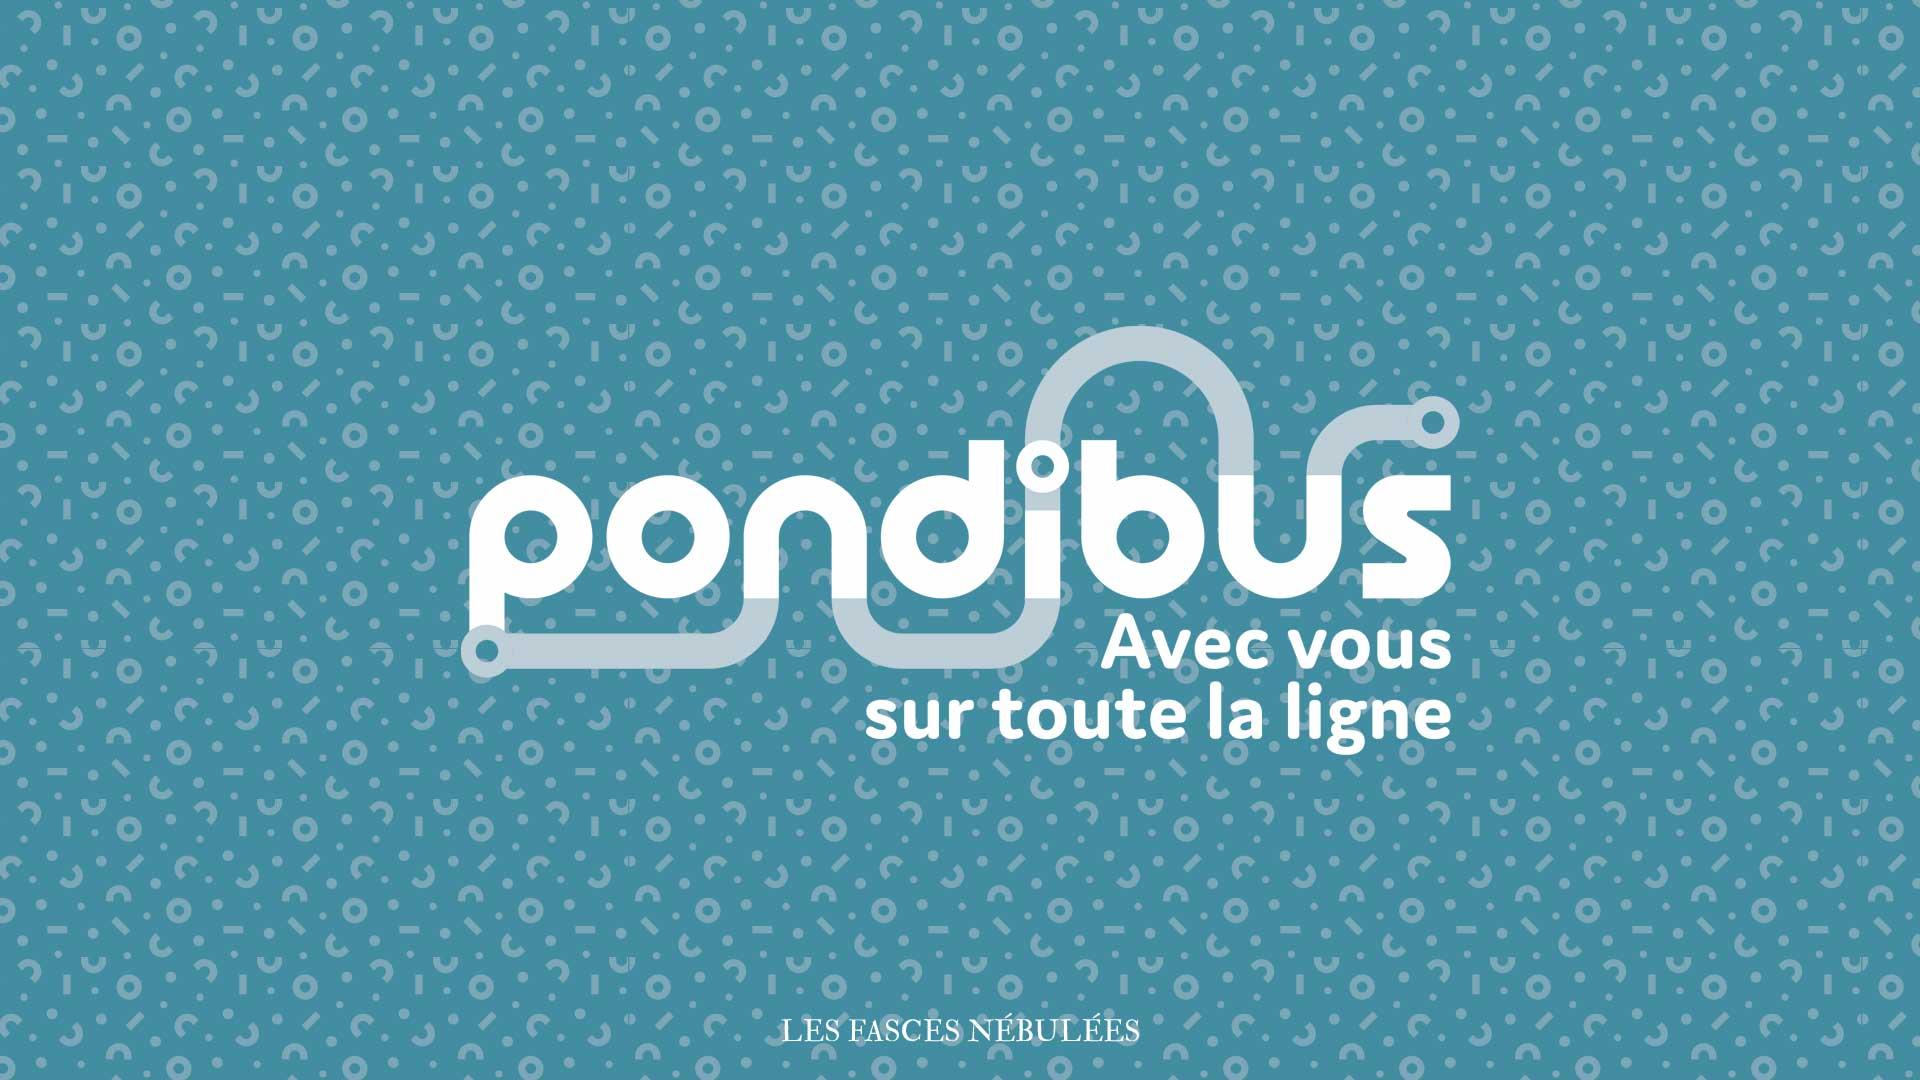 Pondibus Transport en commun